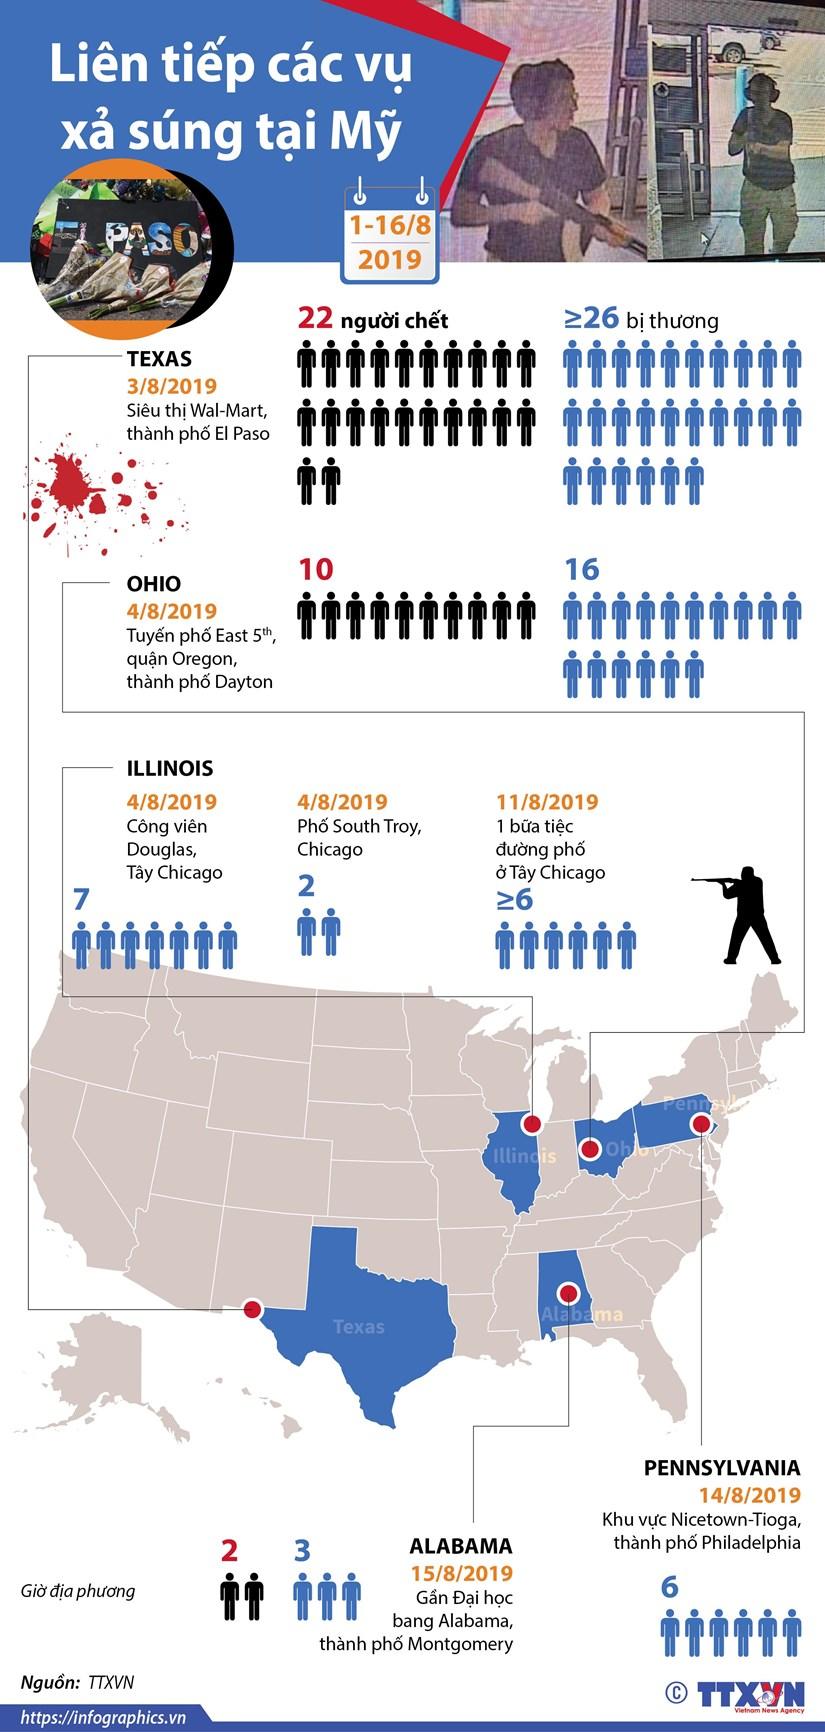 [Infographics] Lien tiep cac vu xa sung tai My tu dau thang 8 hinh anh 1